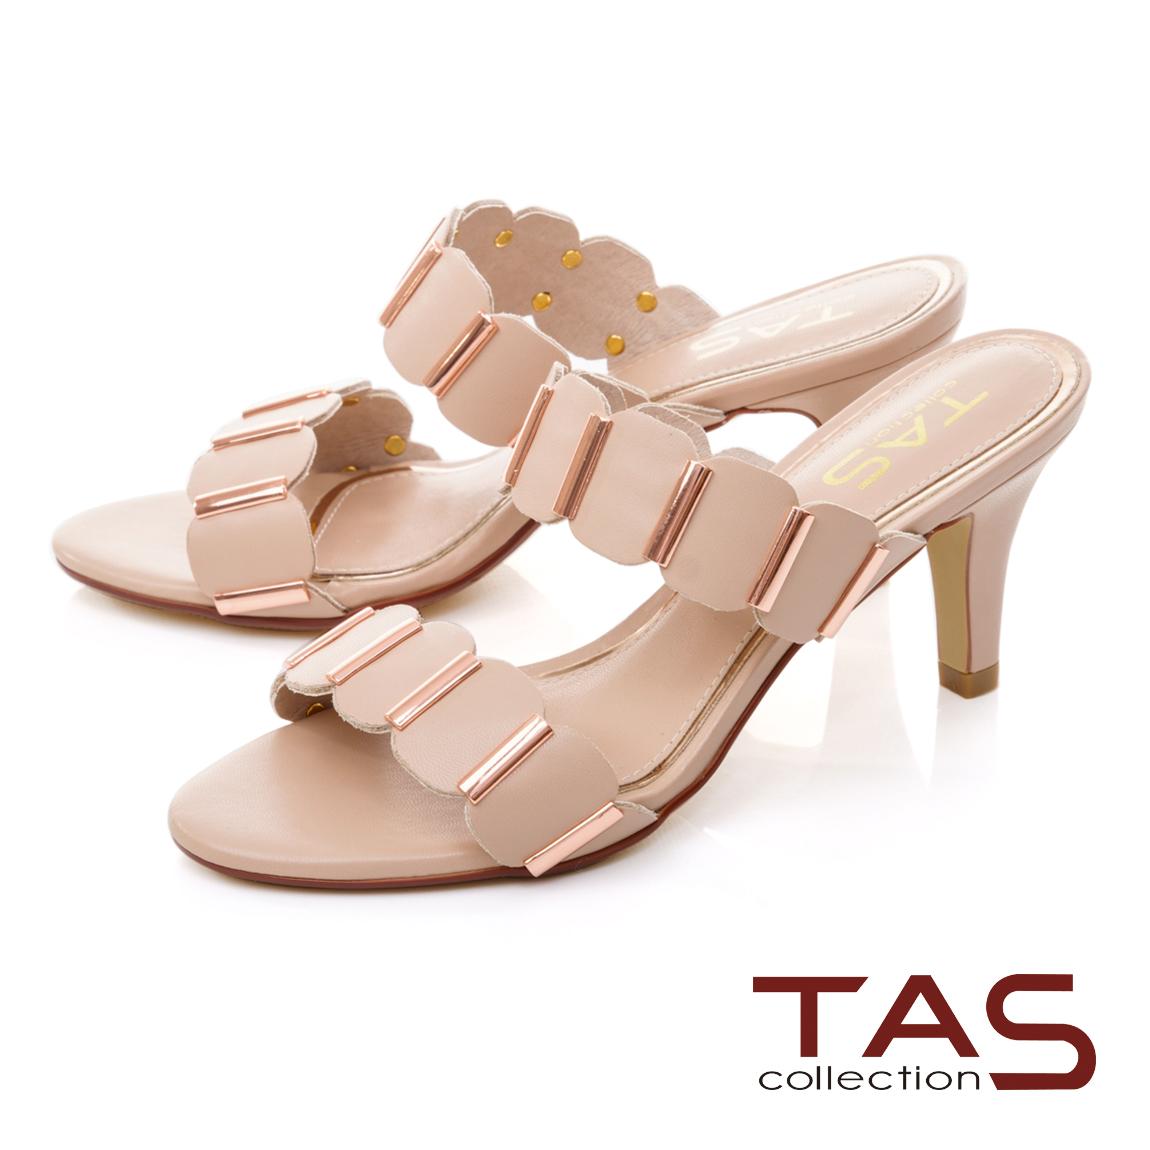 TAS 波浪一字帶涼拖鞋-浪漫粉